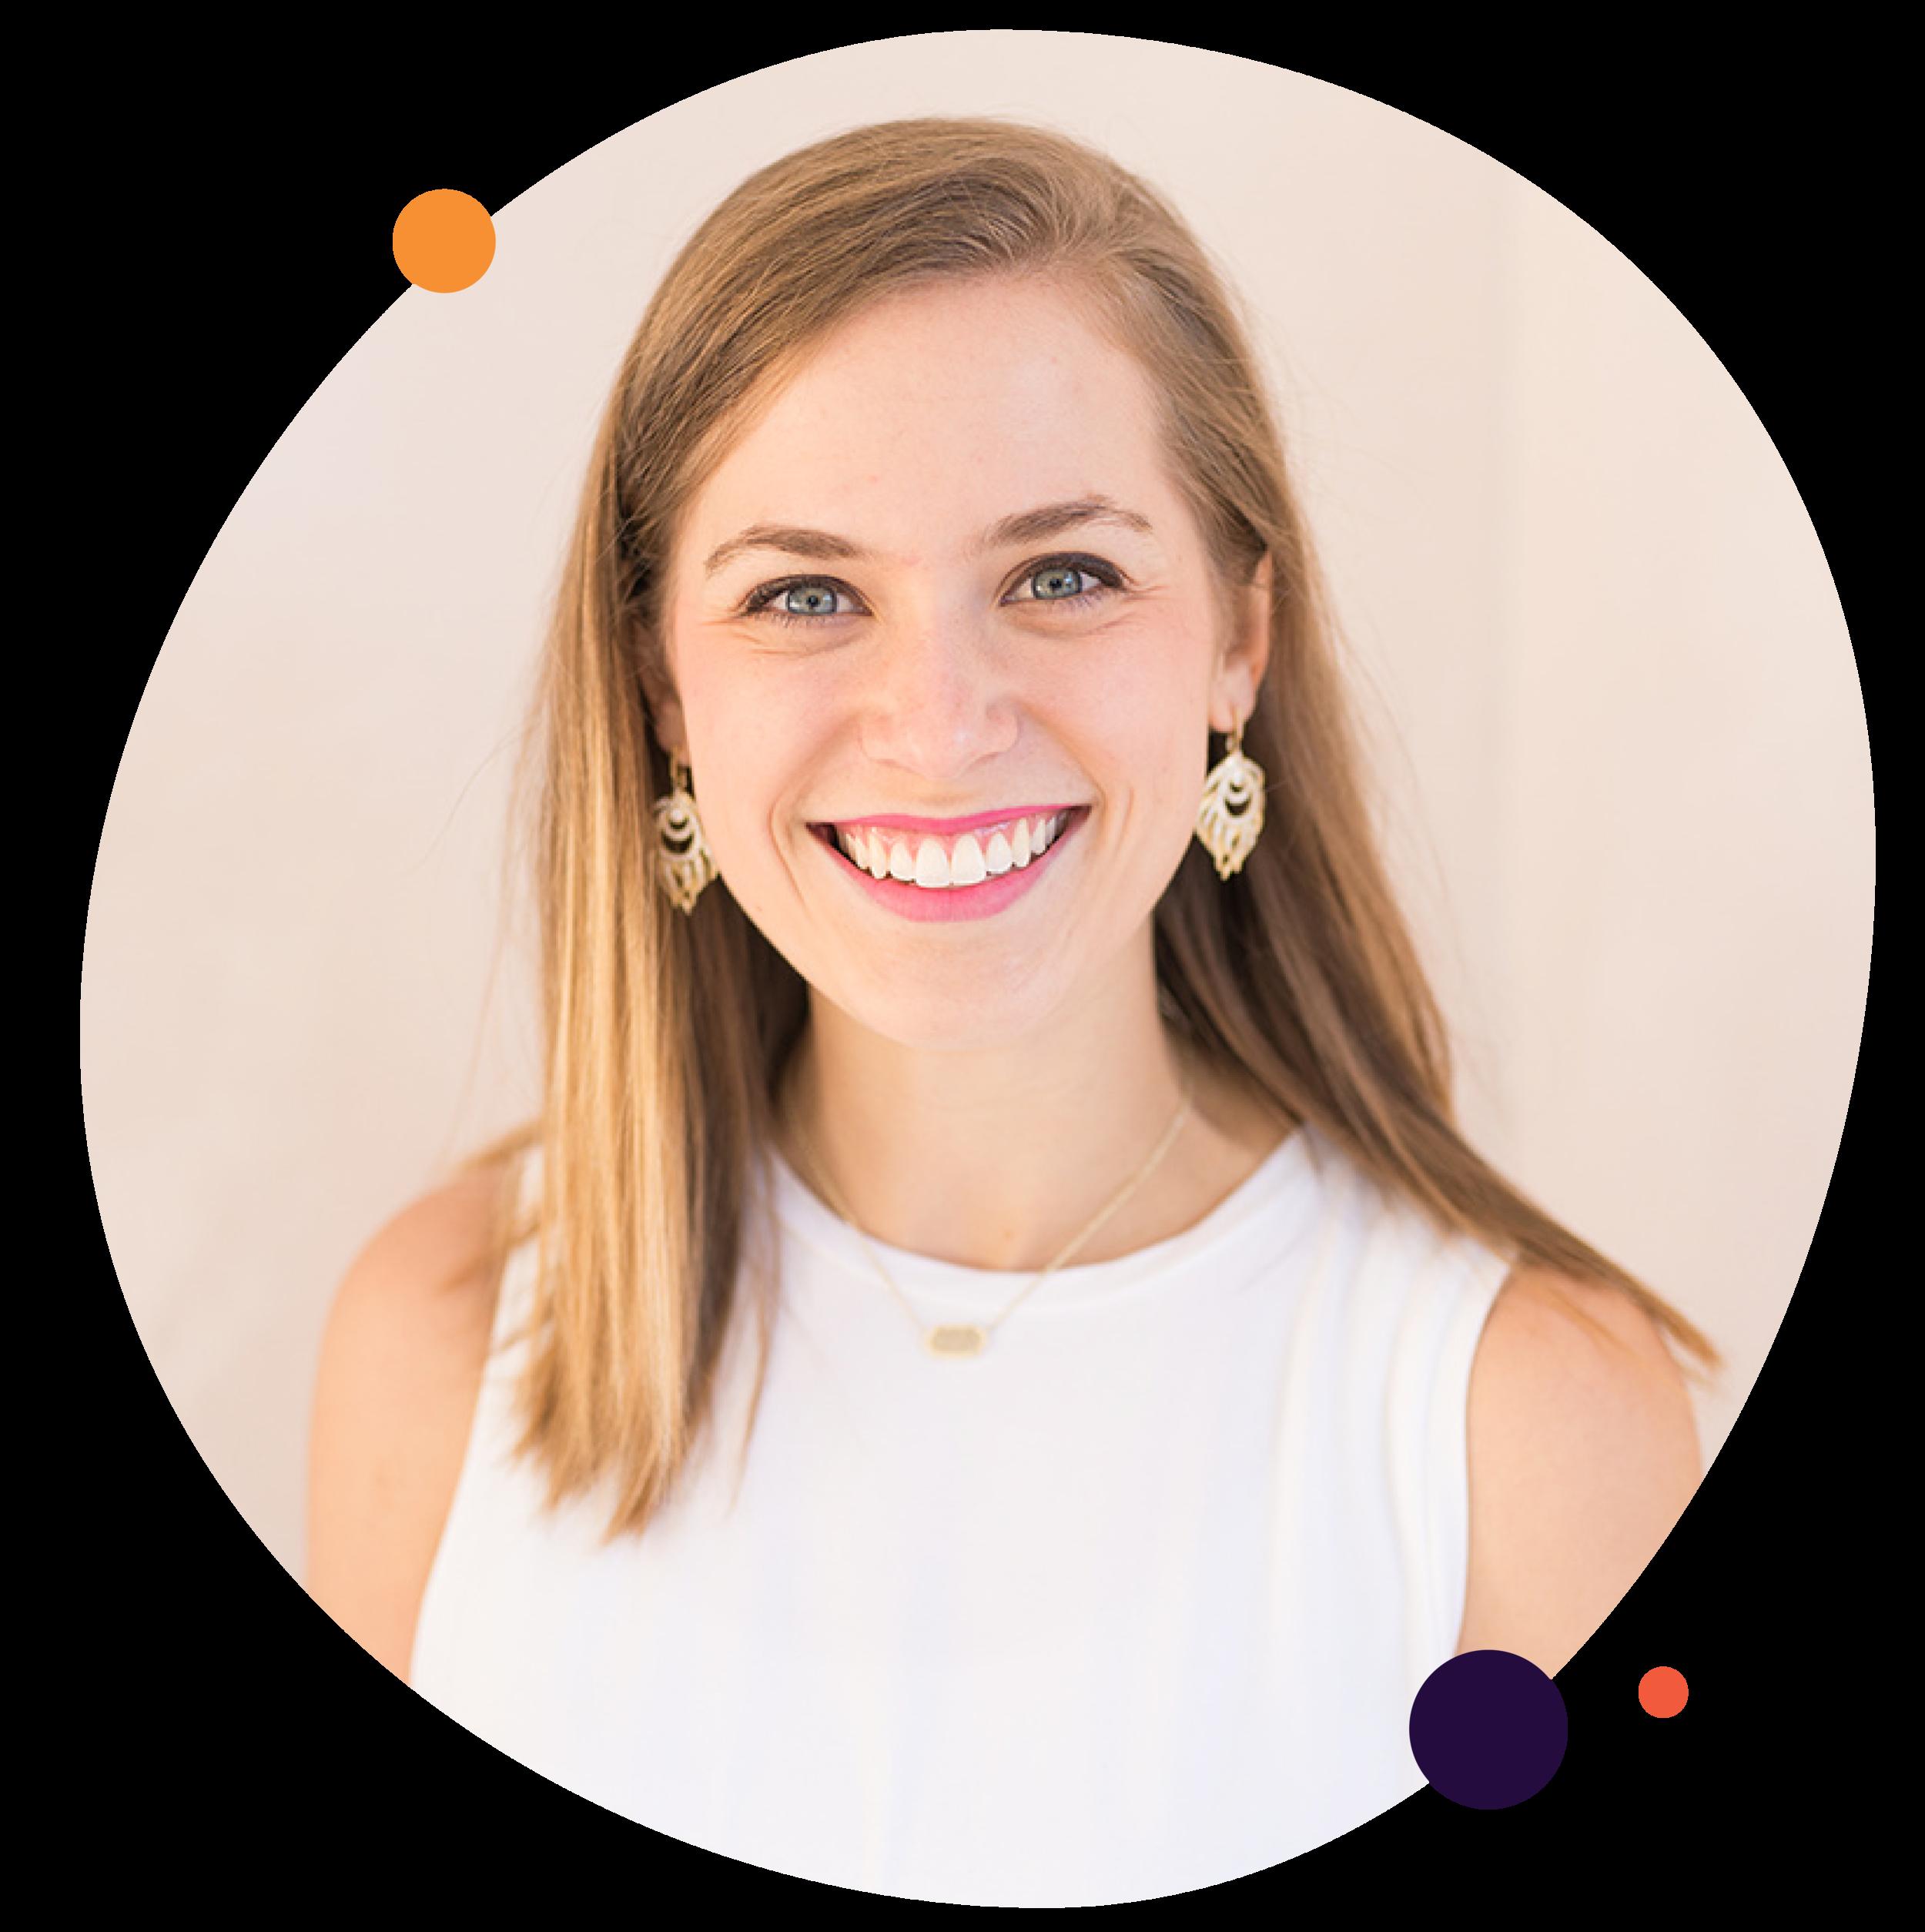 Olivia Mortensen, Marketing - Owner & Lead Designer, Mortensen DesignsOlivia's favorite Fringe benefit: Amazon Prime